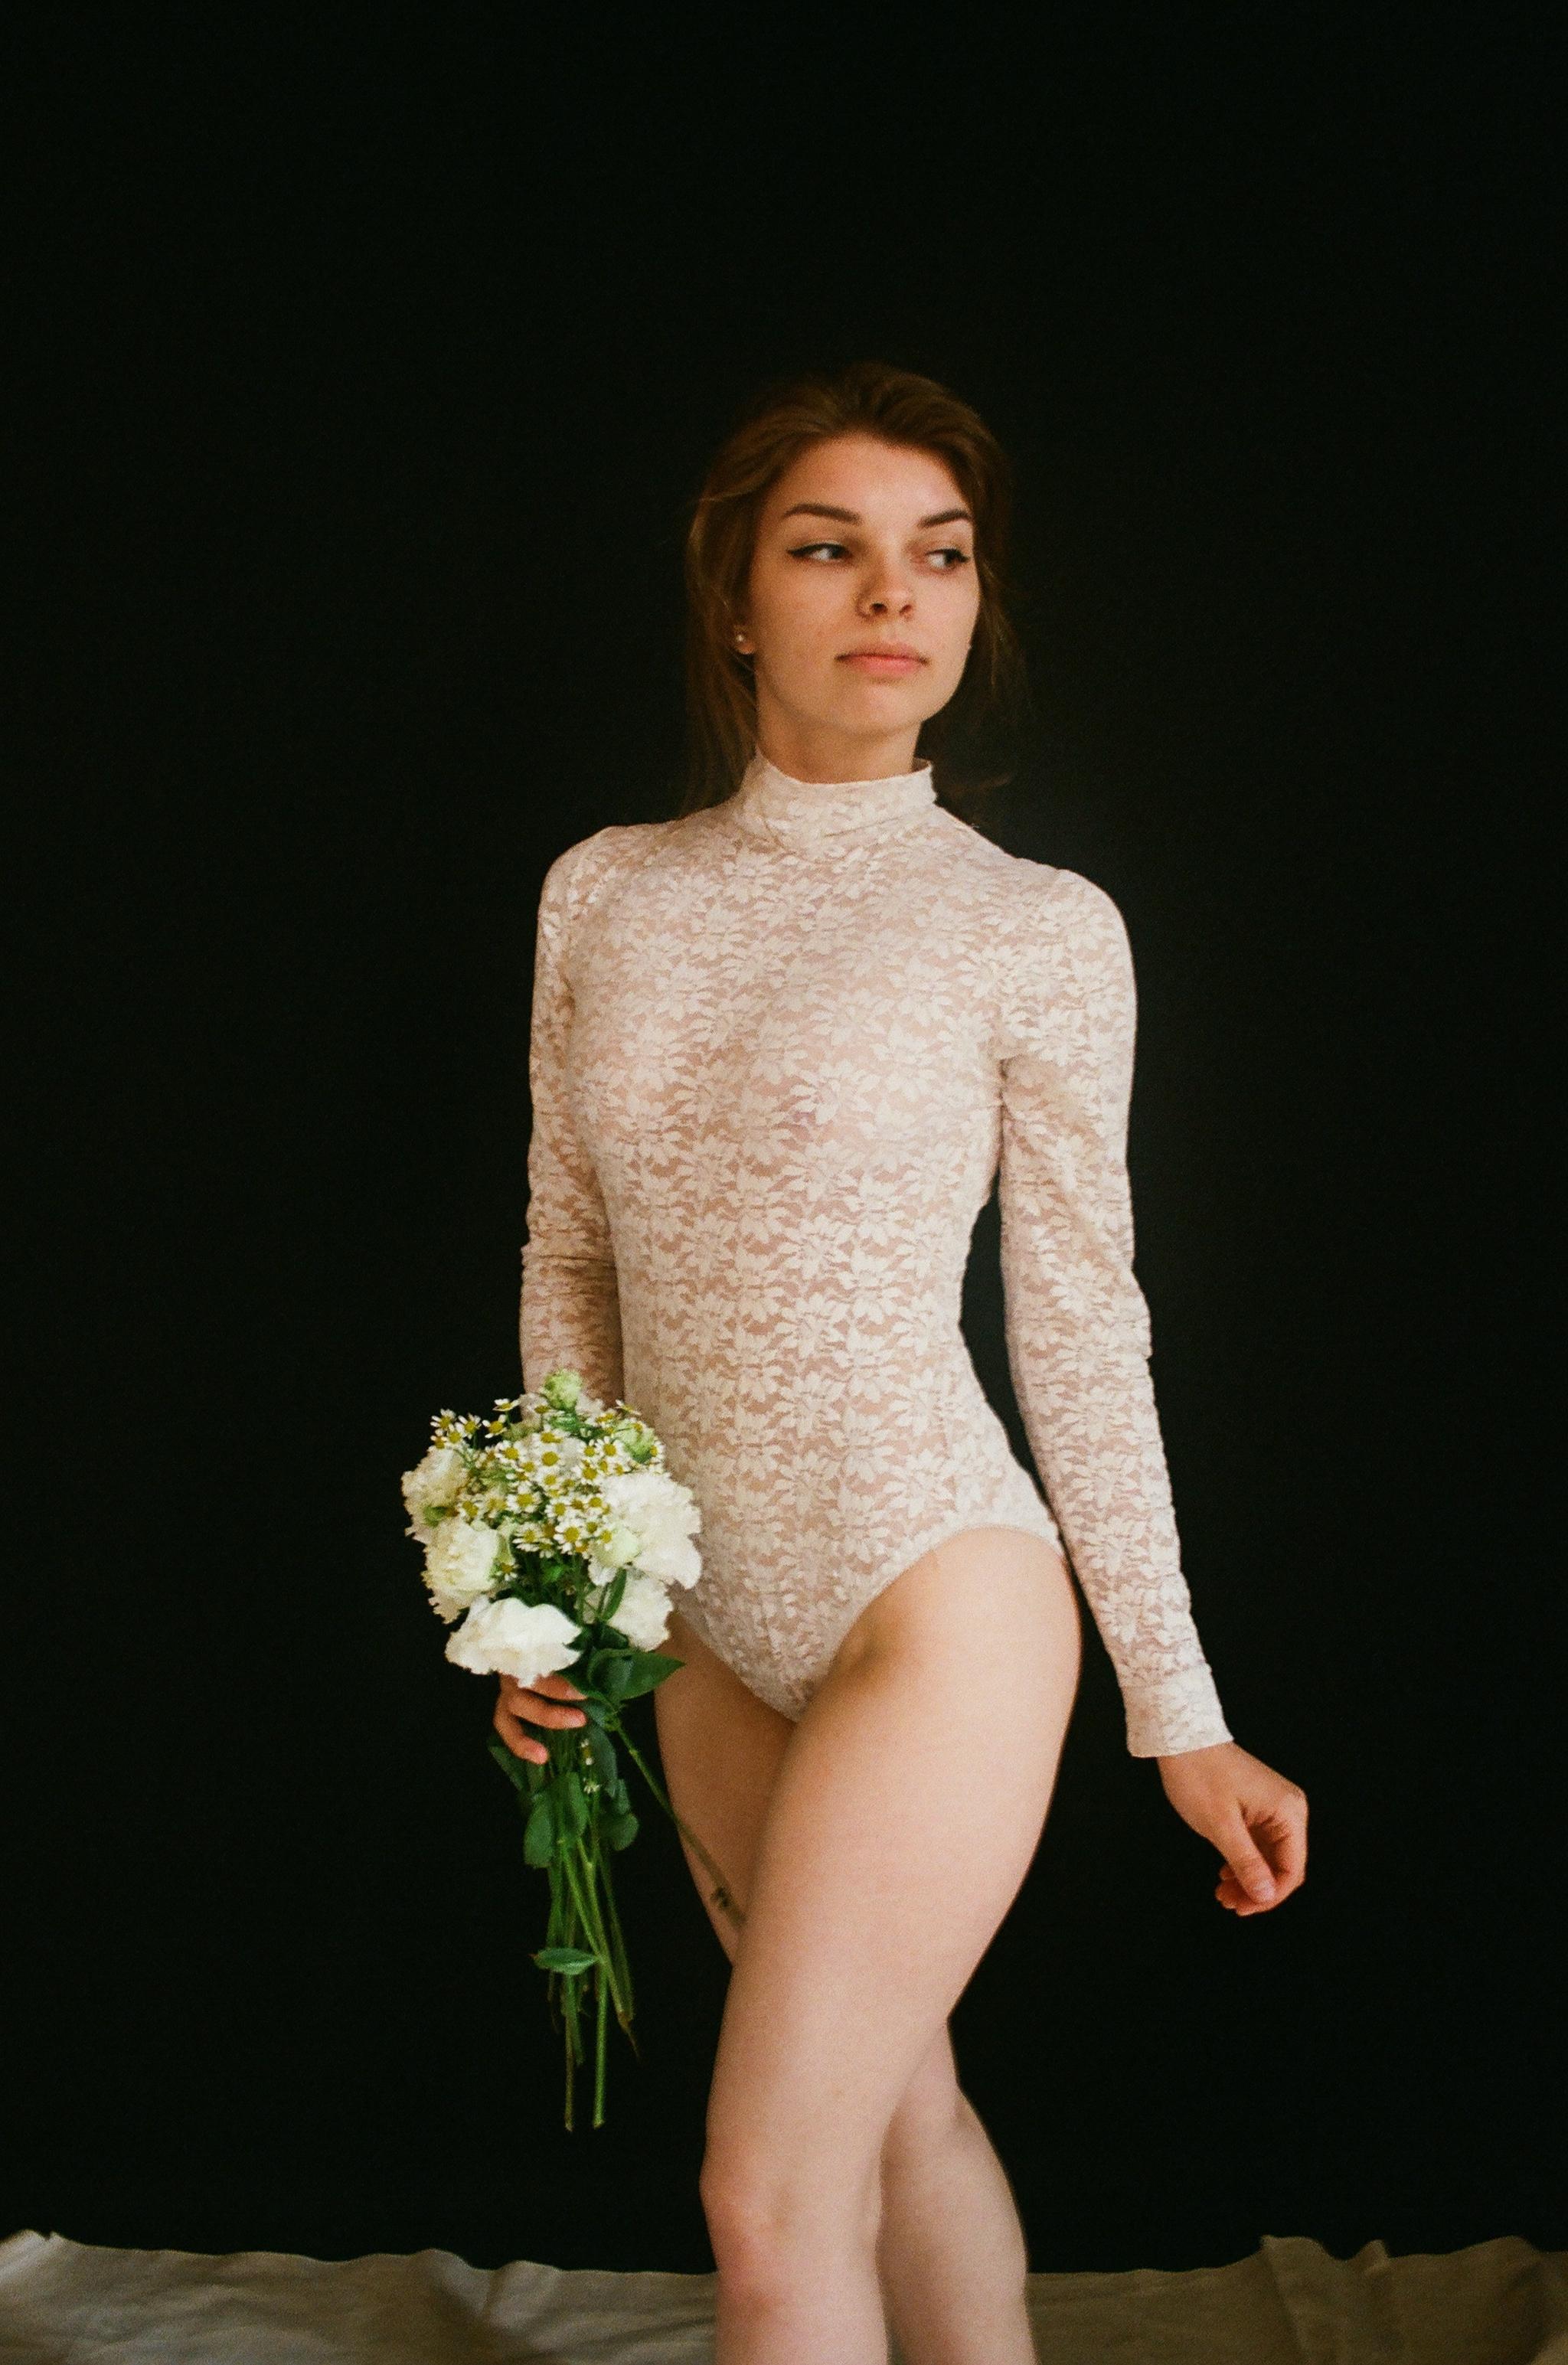 Plan Cul Montpellier ( 34 ) Avec Jeune Femme Sexy